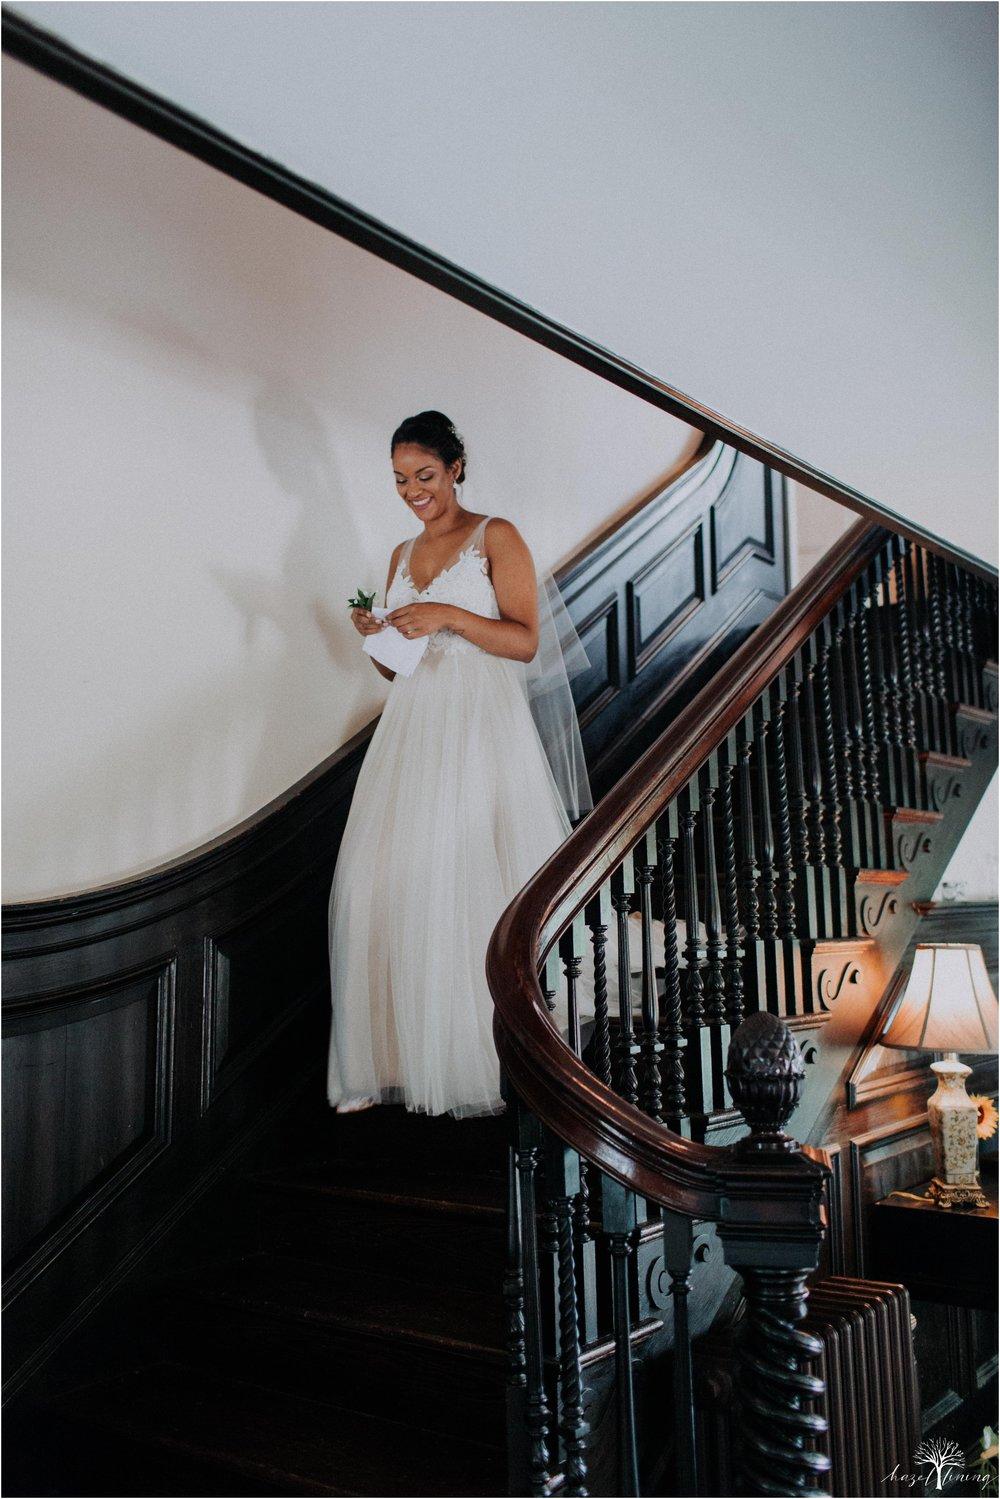 mariah-kreyling-samuel-sherratt-sherrattwiththeworld-peirce-farm-at-witch-hill-boston-massachusetts-wedding-photography-hazel-lining-travel-wedding-elopement-photography_0016.jpg